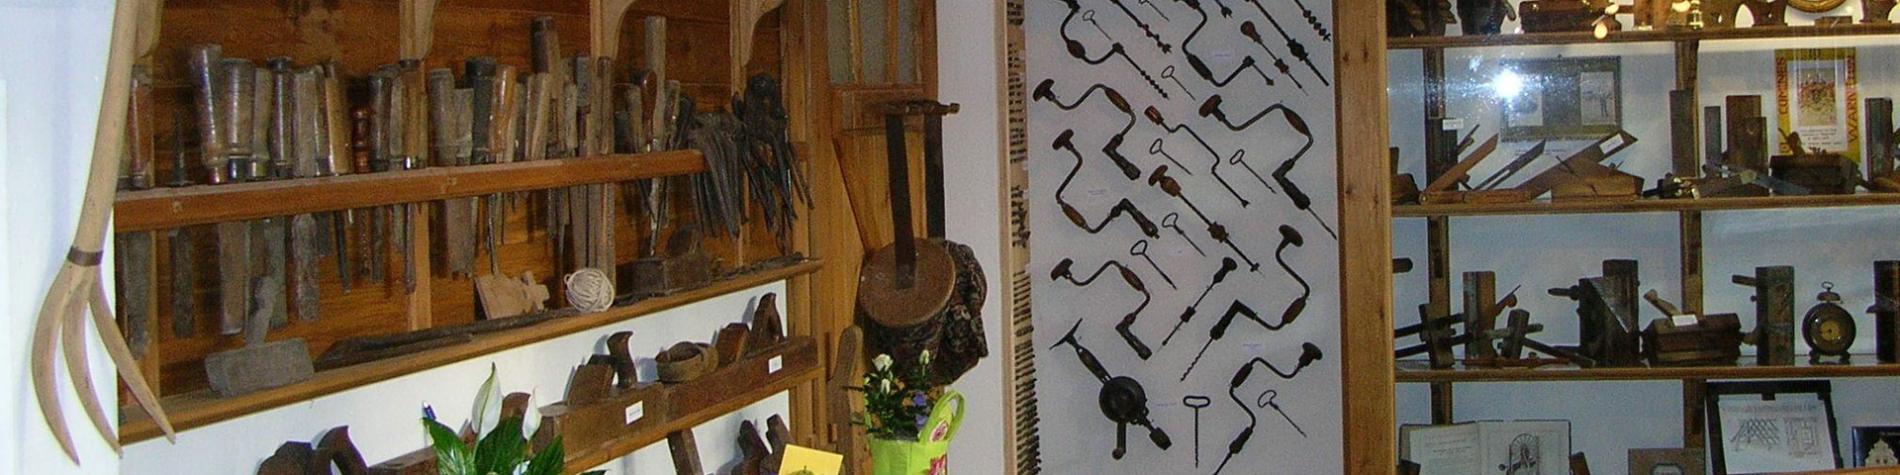 Musée rural - Menuiserie - Autrefois - Ploegsteert